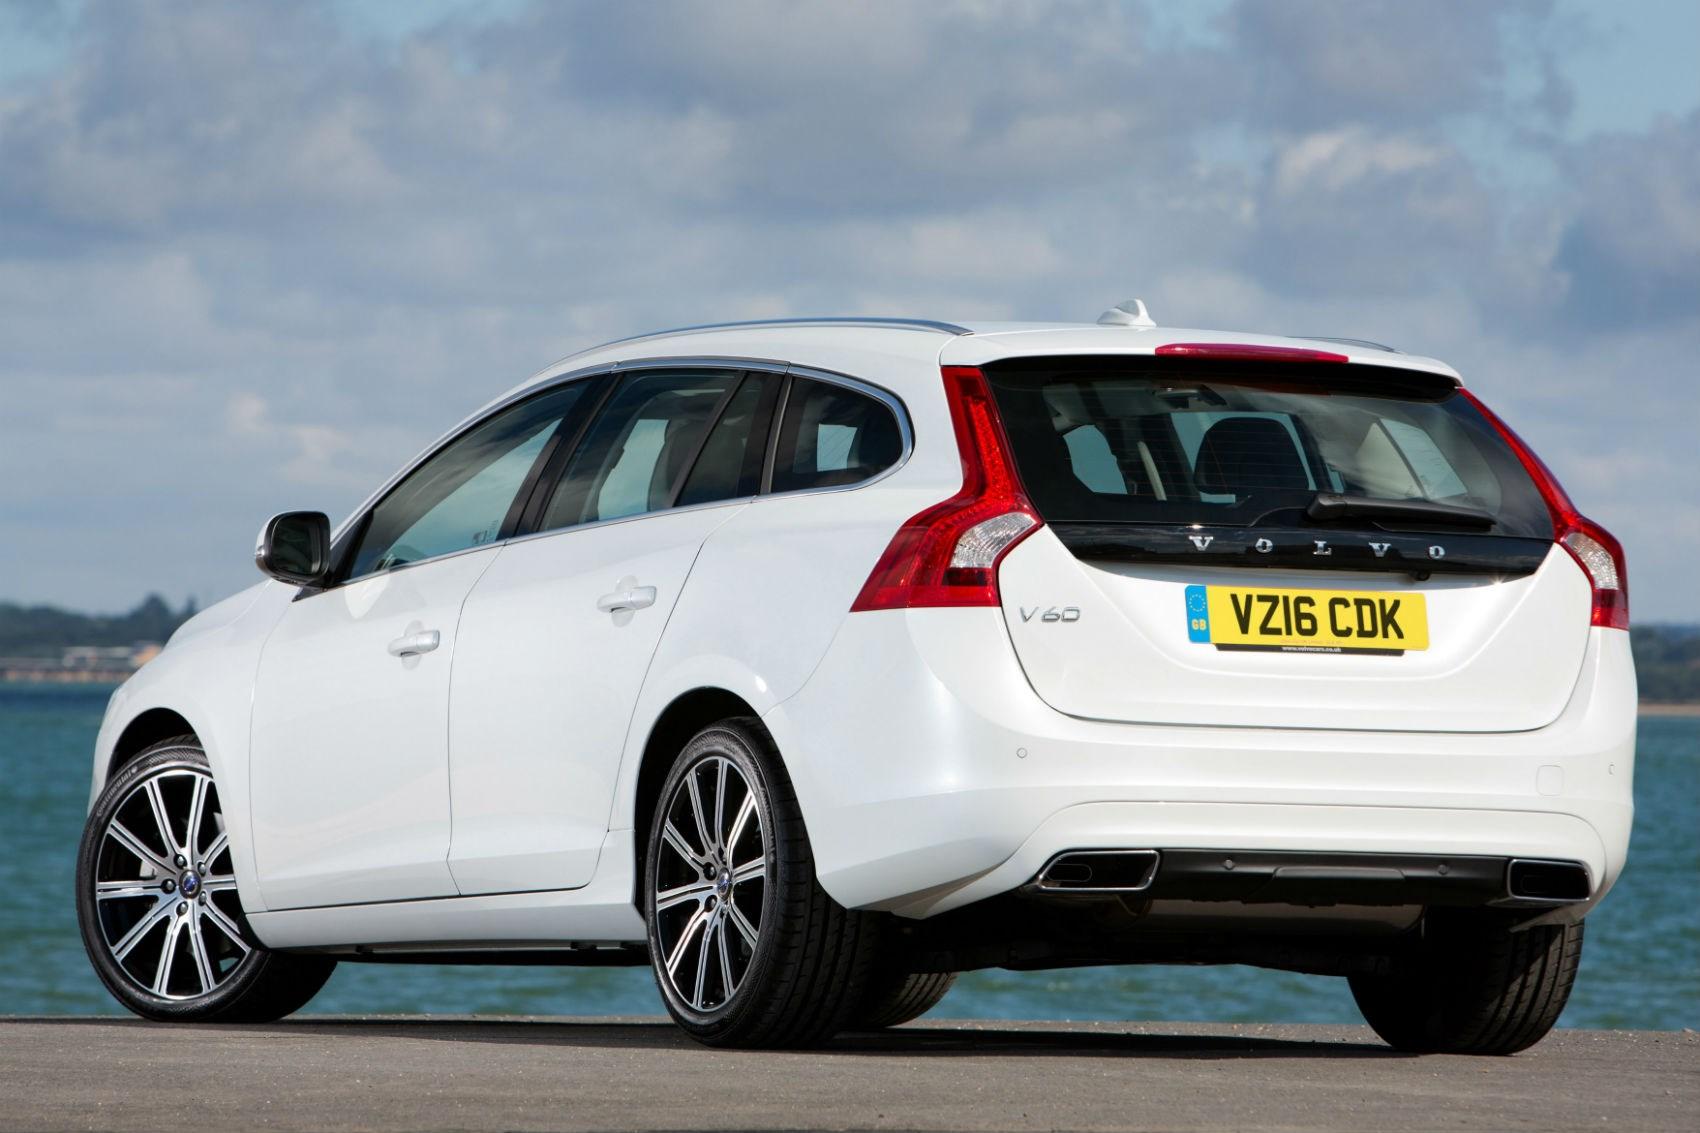 Volvo V60 cash discount